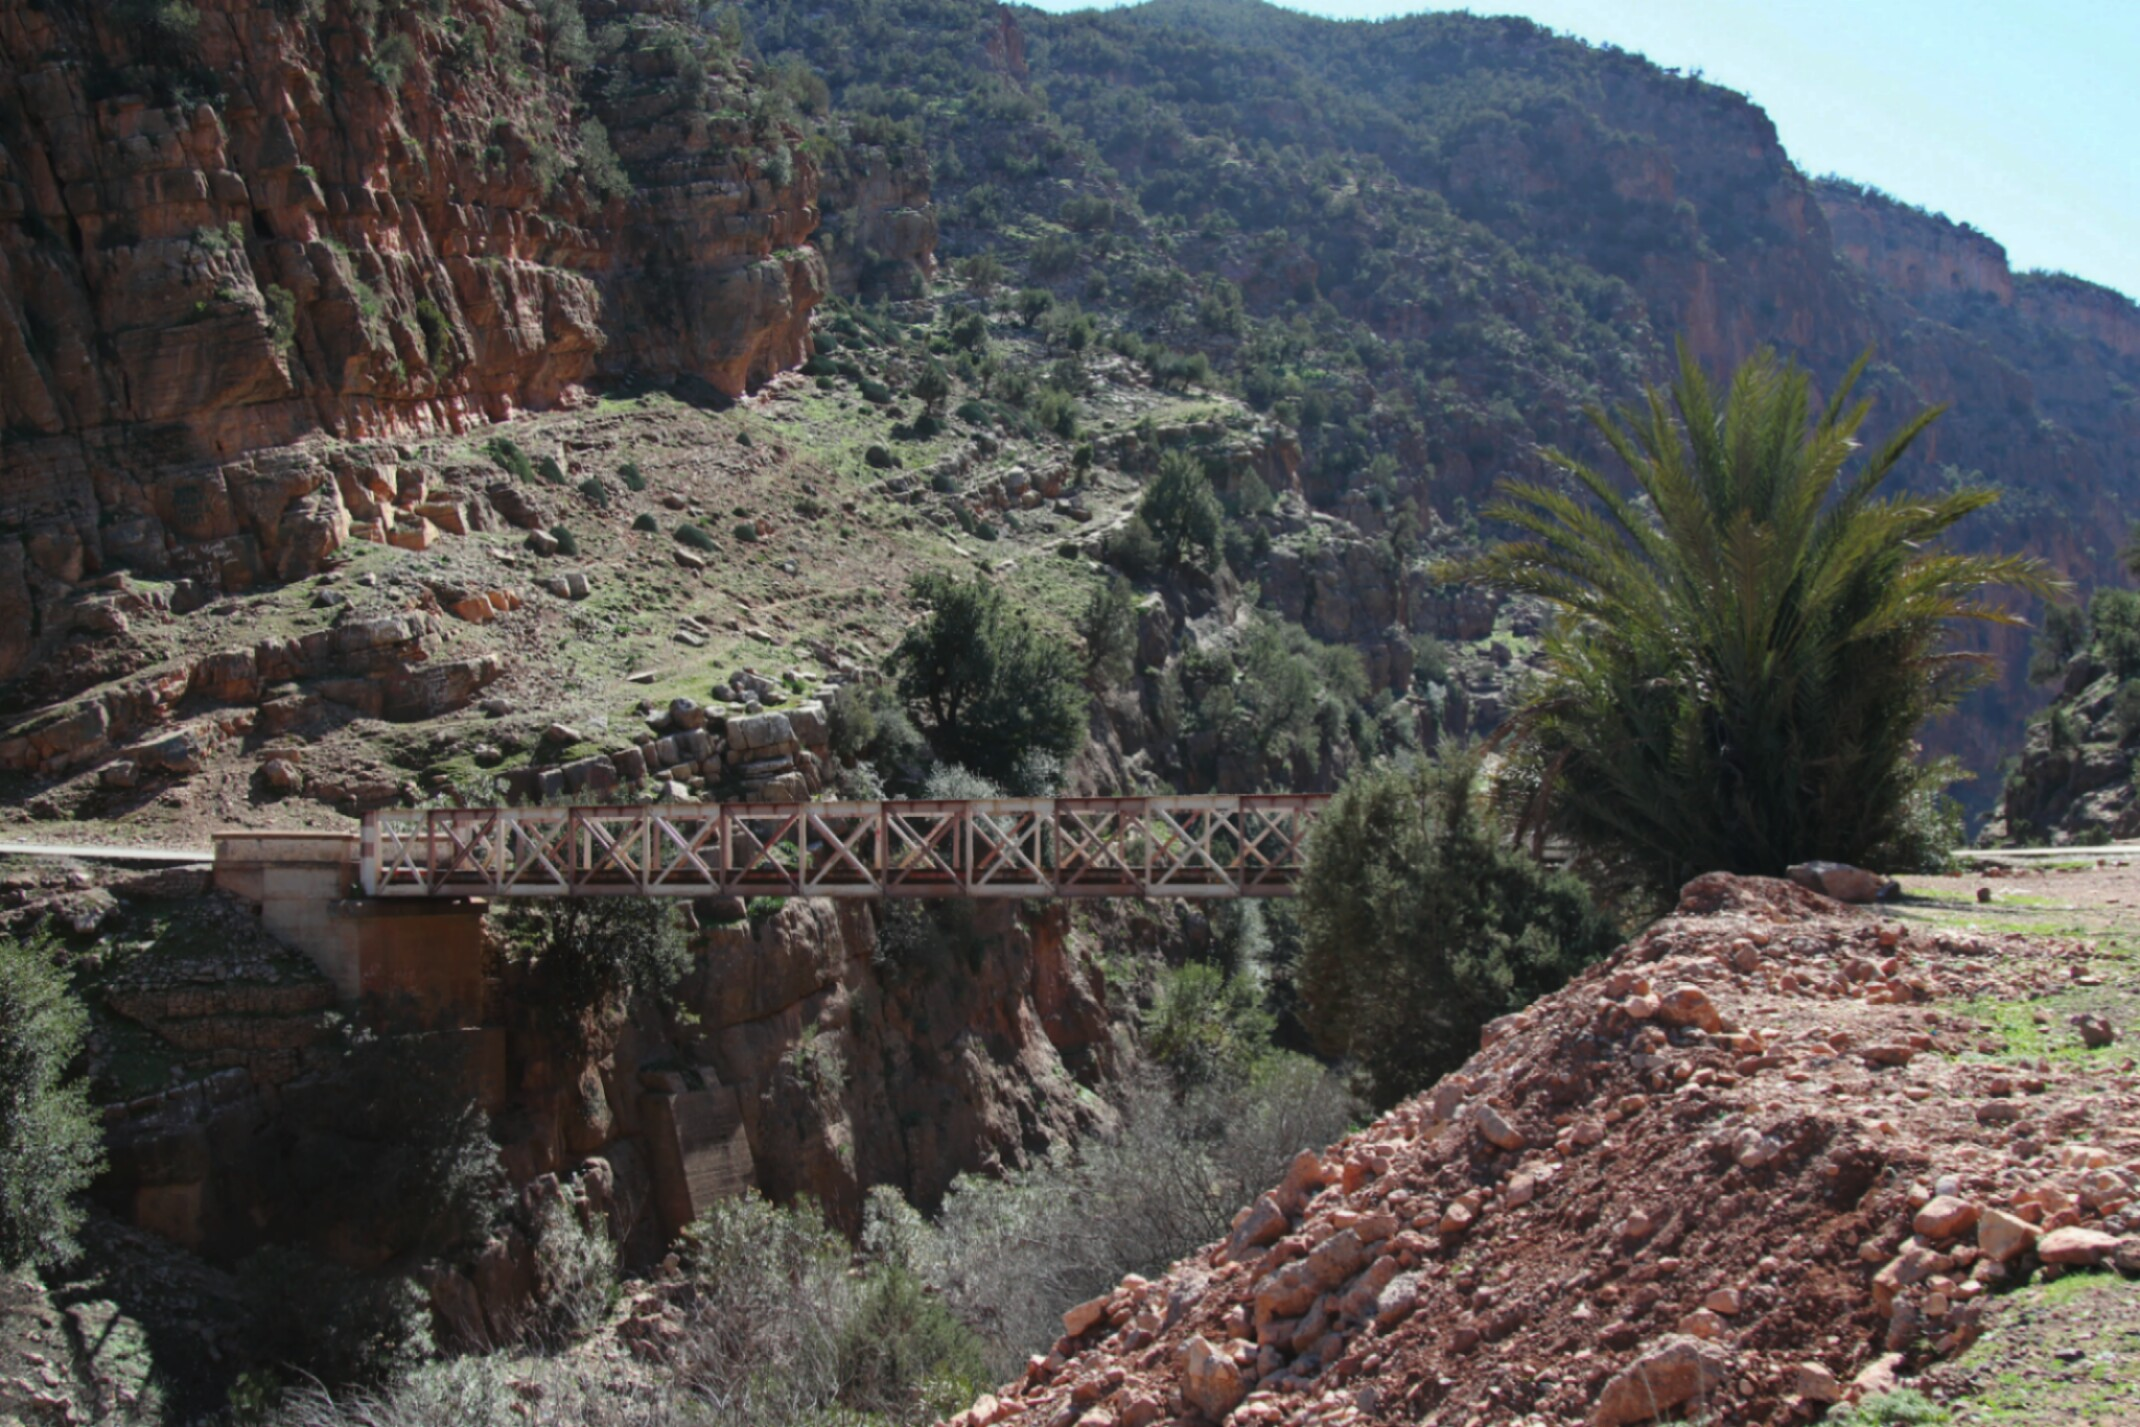 wodospady Szallalat Uzud